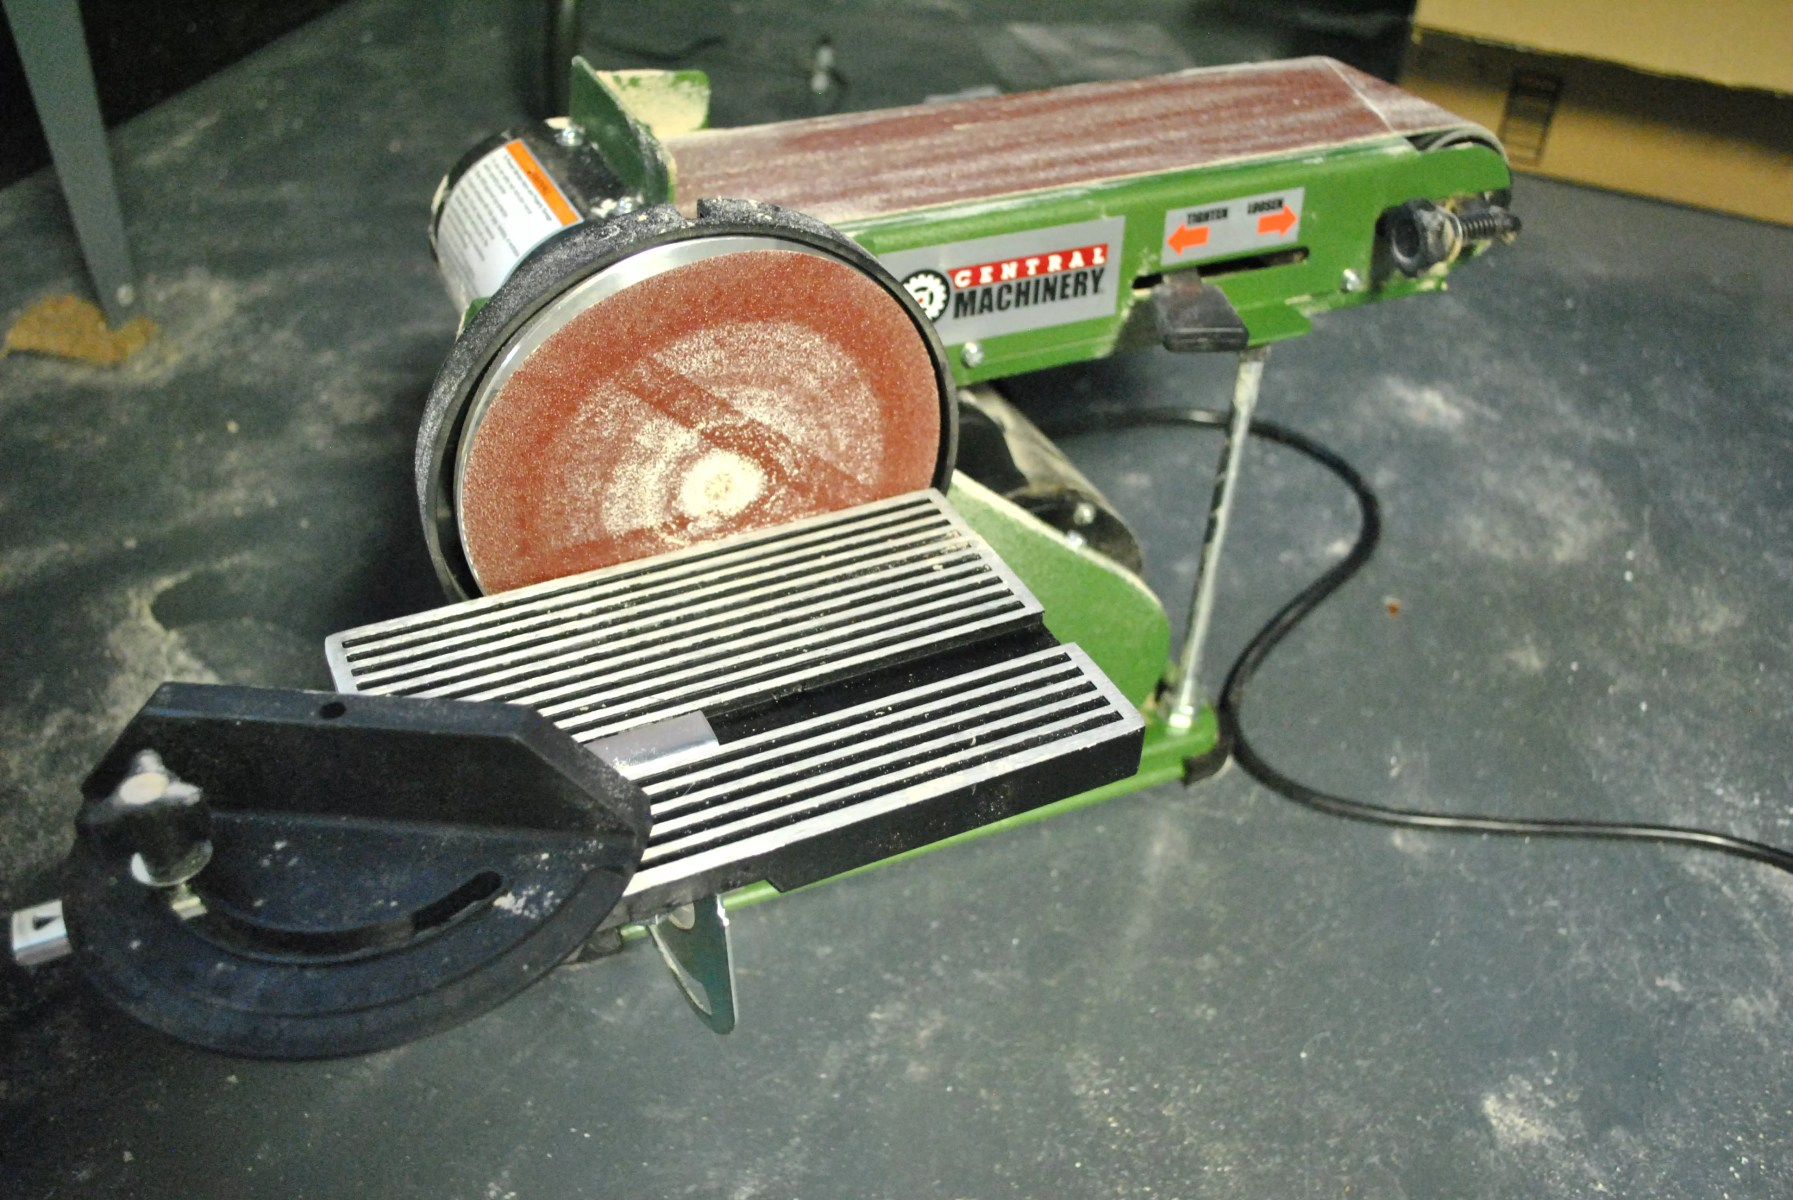 central machinery belt sander